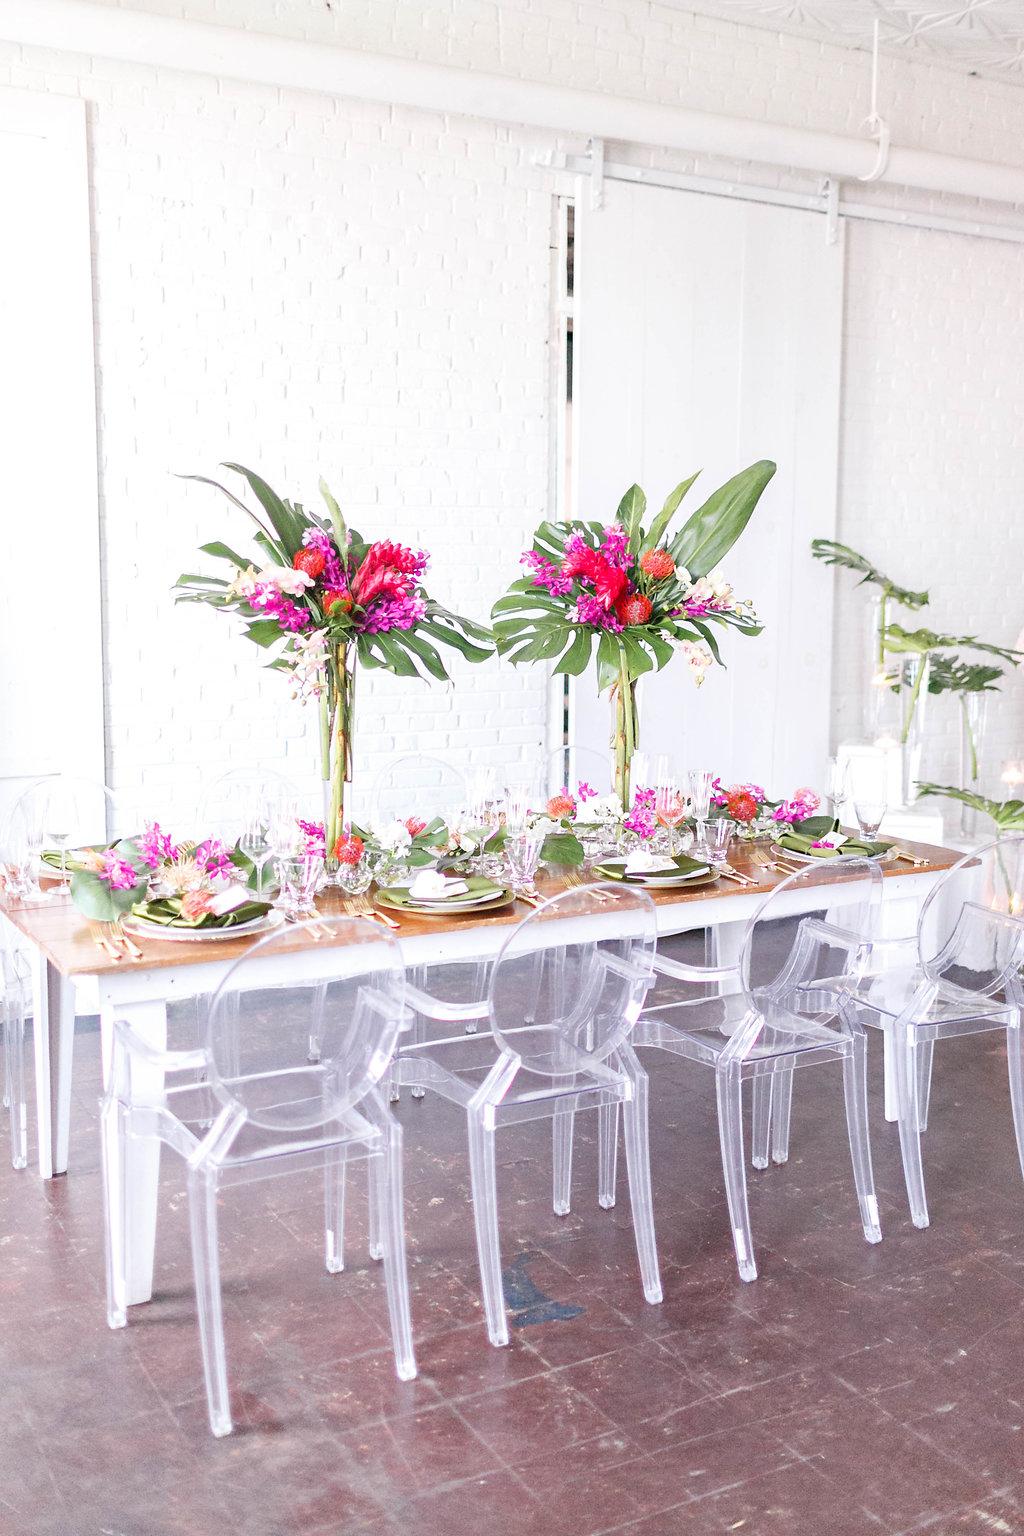 tropical wedding inspiration - photo by Virginia Ashley Photography http://ruffledblog.com/modern-industrial-wedding-inspiration-with-tropical-vibes